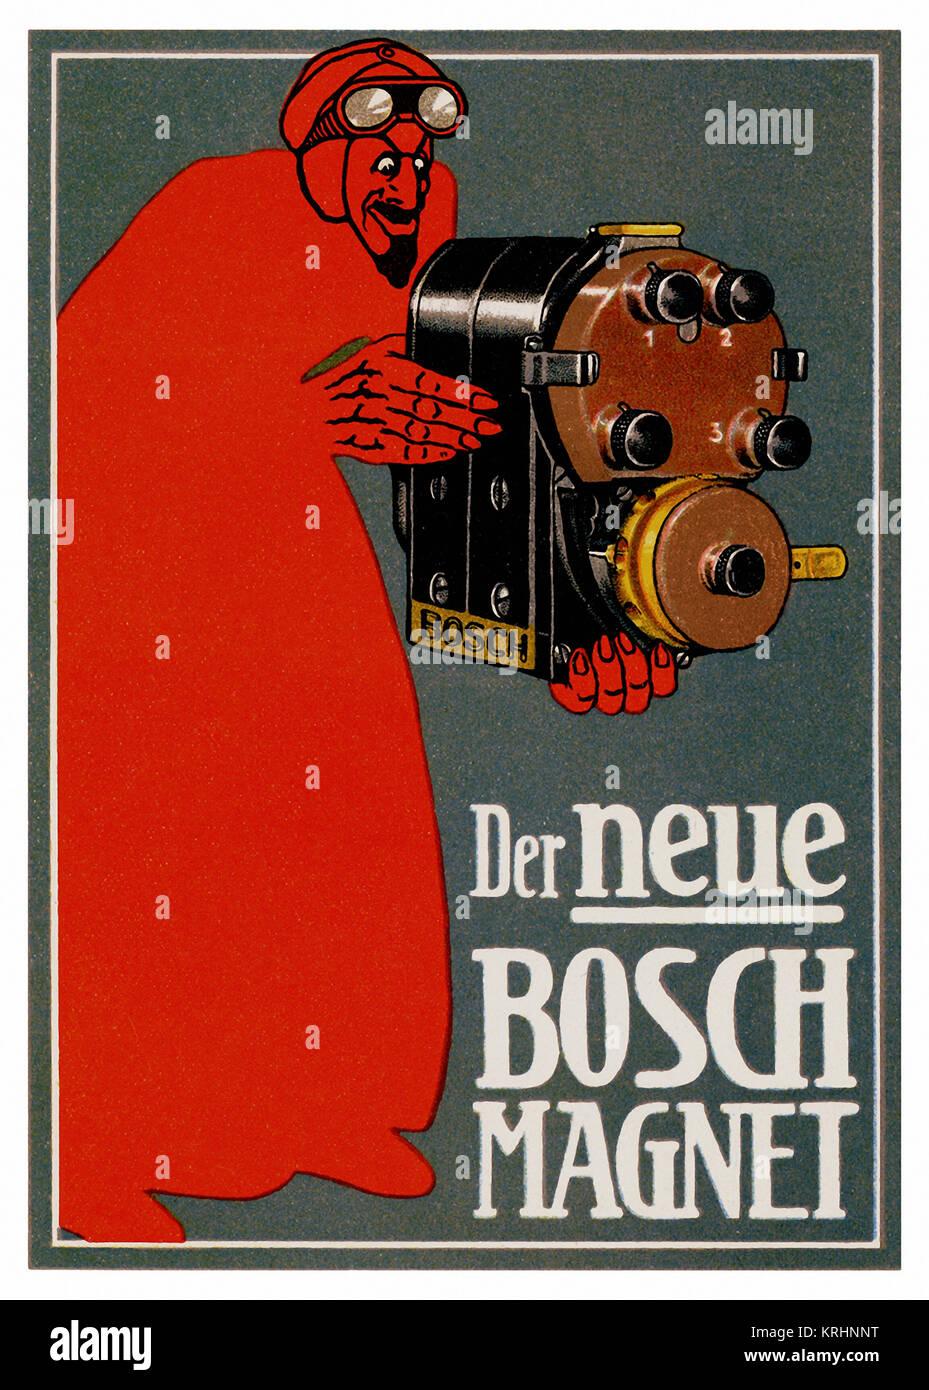 New Bosch Motor magnet - Stock Image